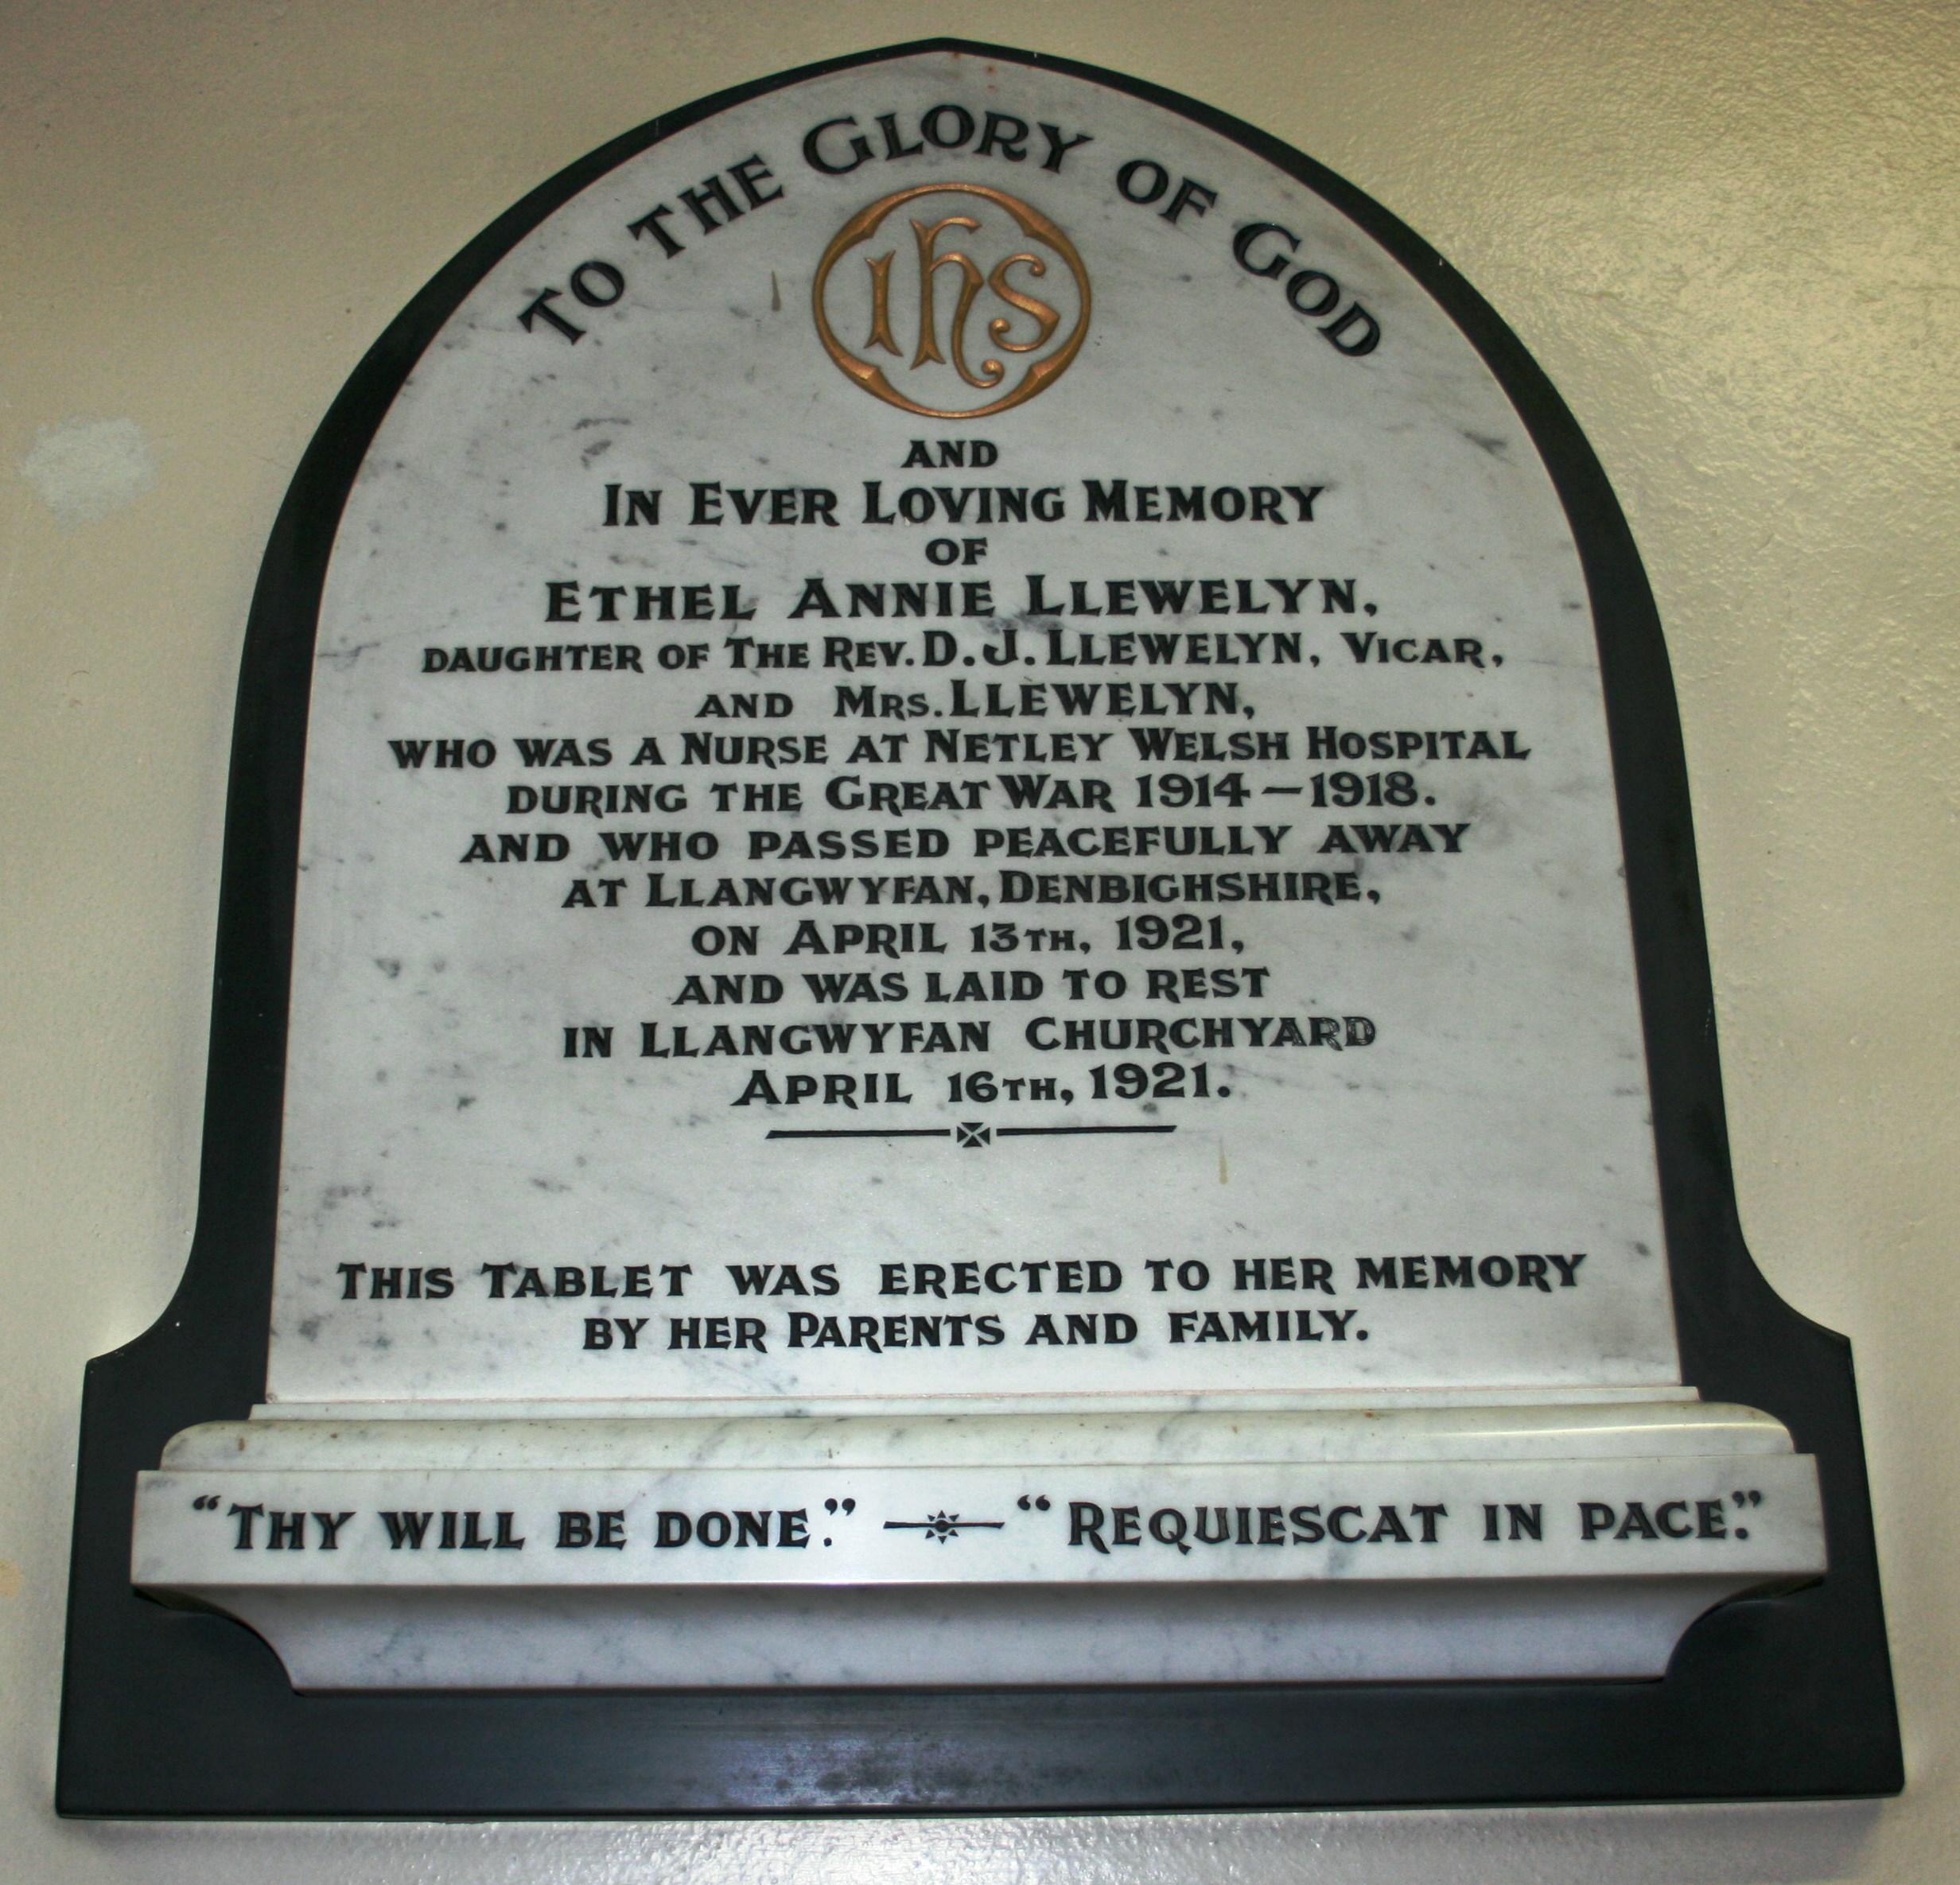 Ethel Annie Llewelyn memorial plaque